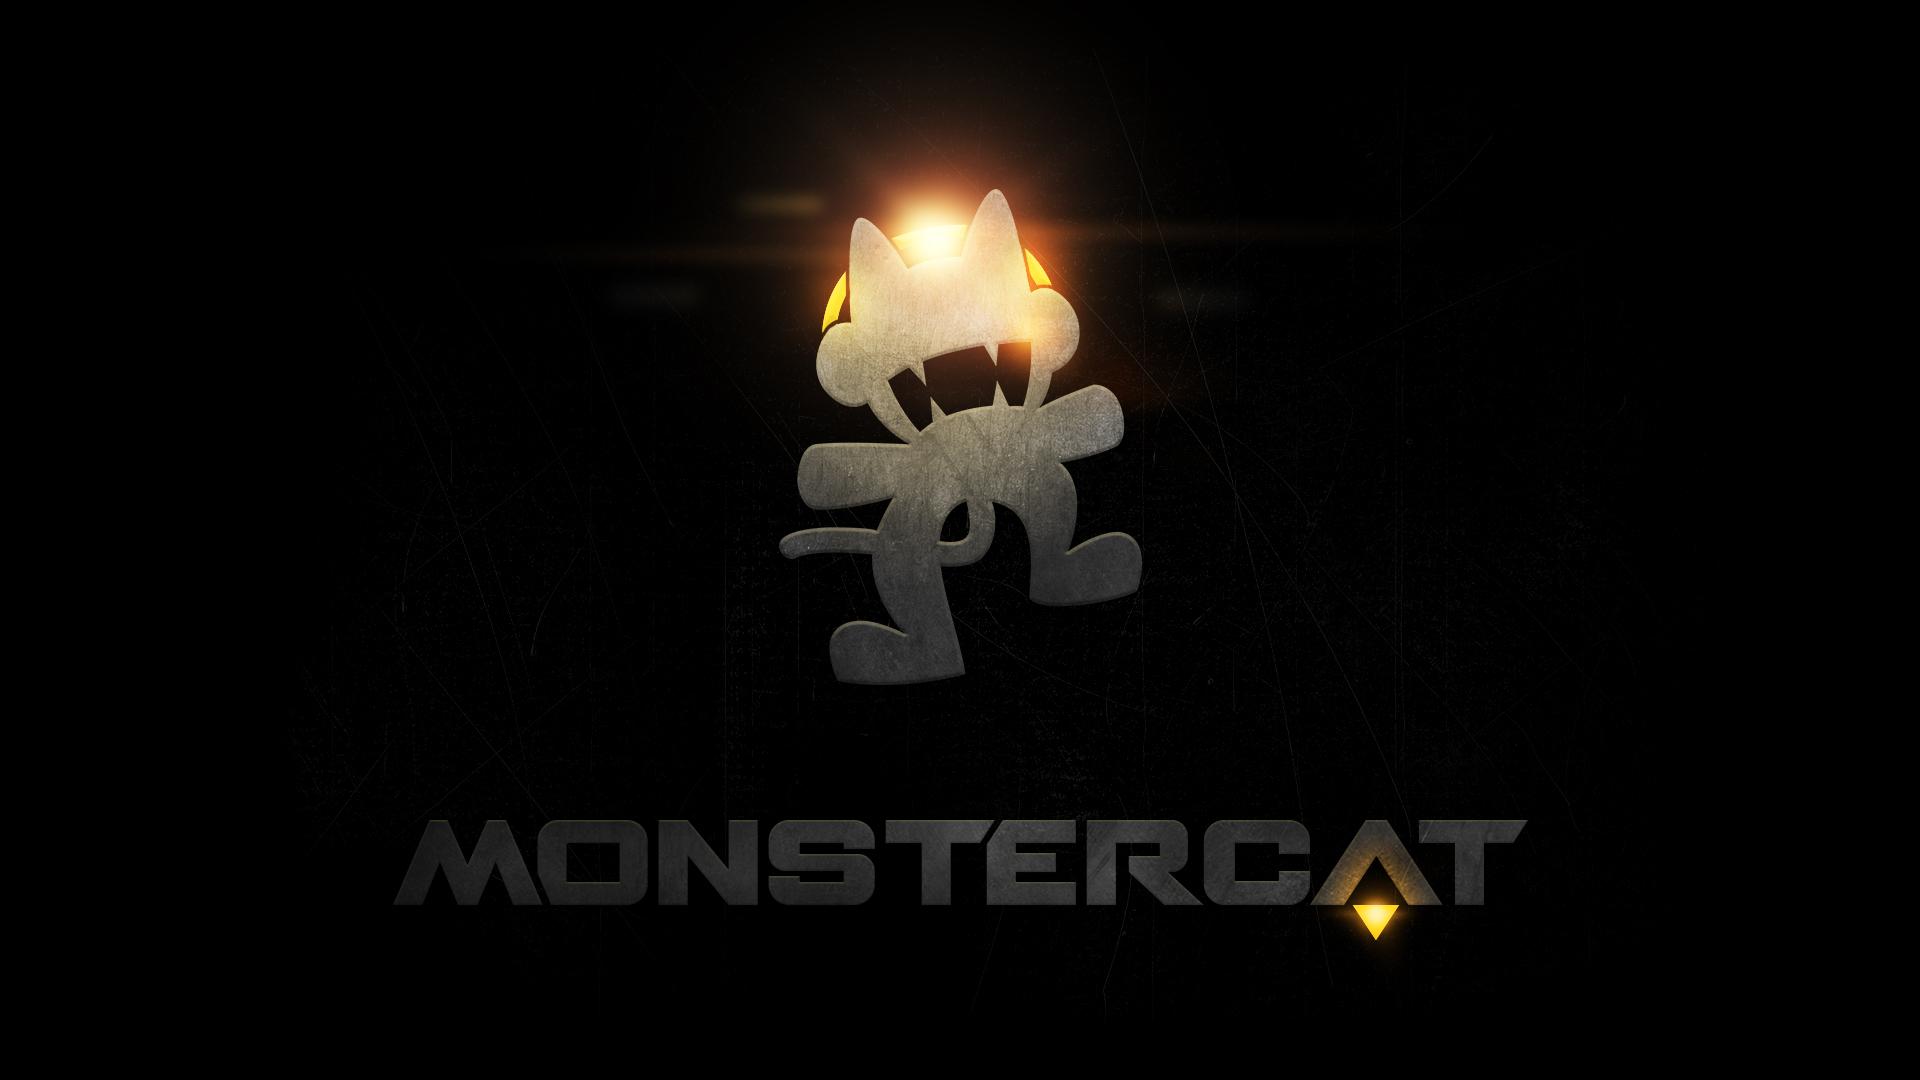 Monstercat computer wallpapers desktop backgrounds 1920x1080 id - Musik Monstercat Bakgrund Ladda Ner Next Wallpaper F Reg Ende Bakgrundsbild